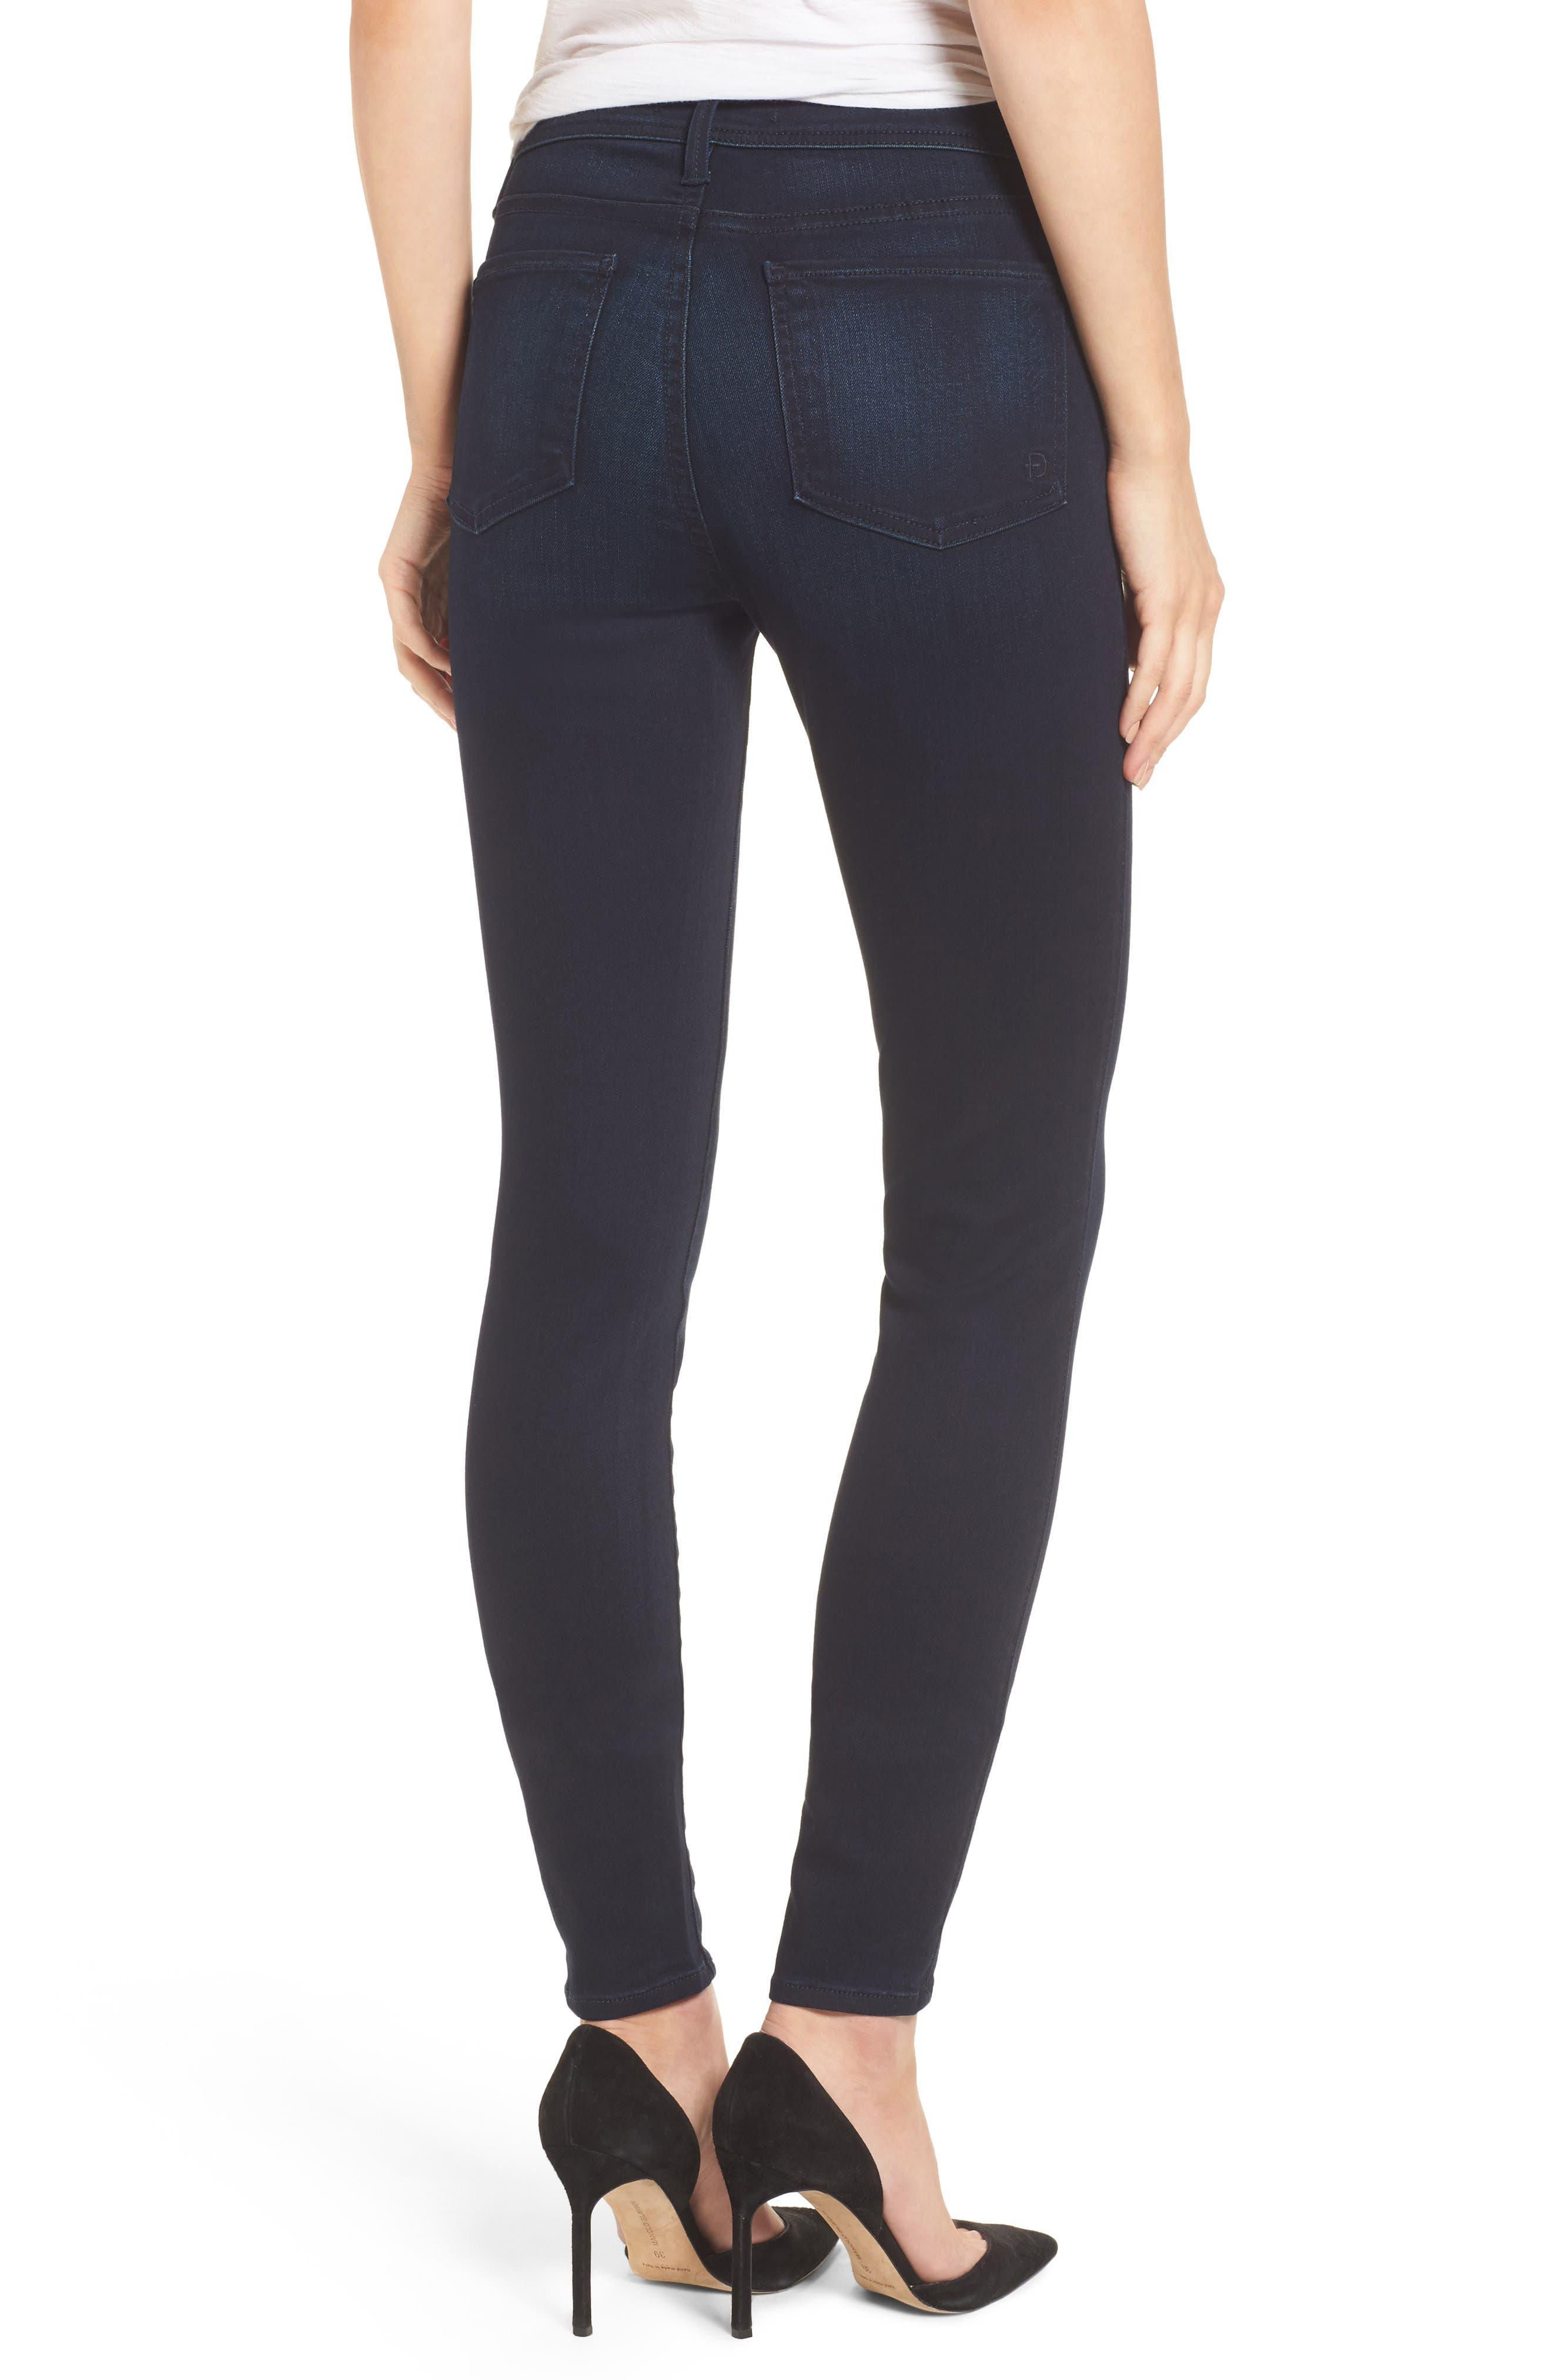 Fidelity Jeans Belvedere Skinny Jeans,                             Alternate thumbnail 2, color,                             400